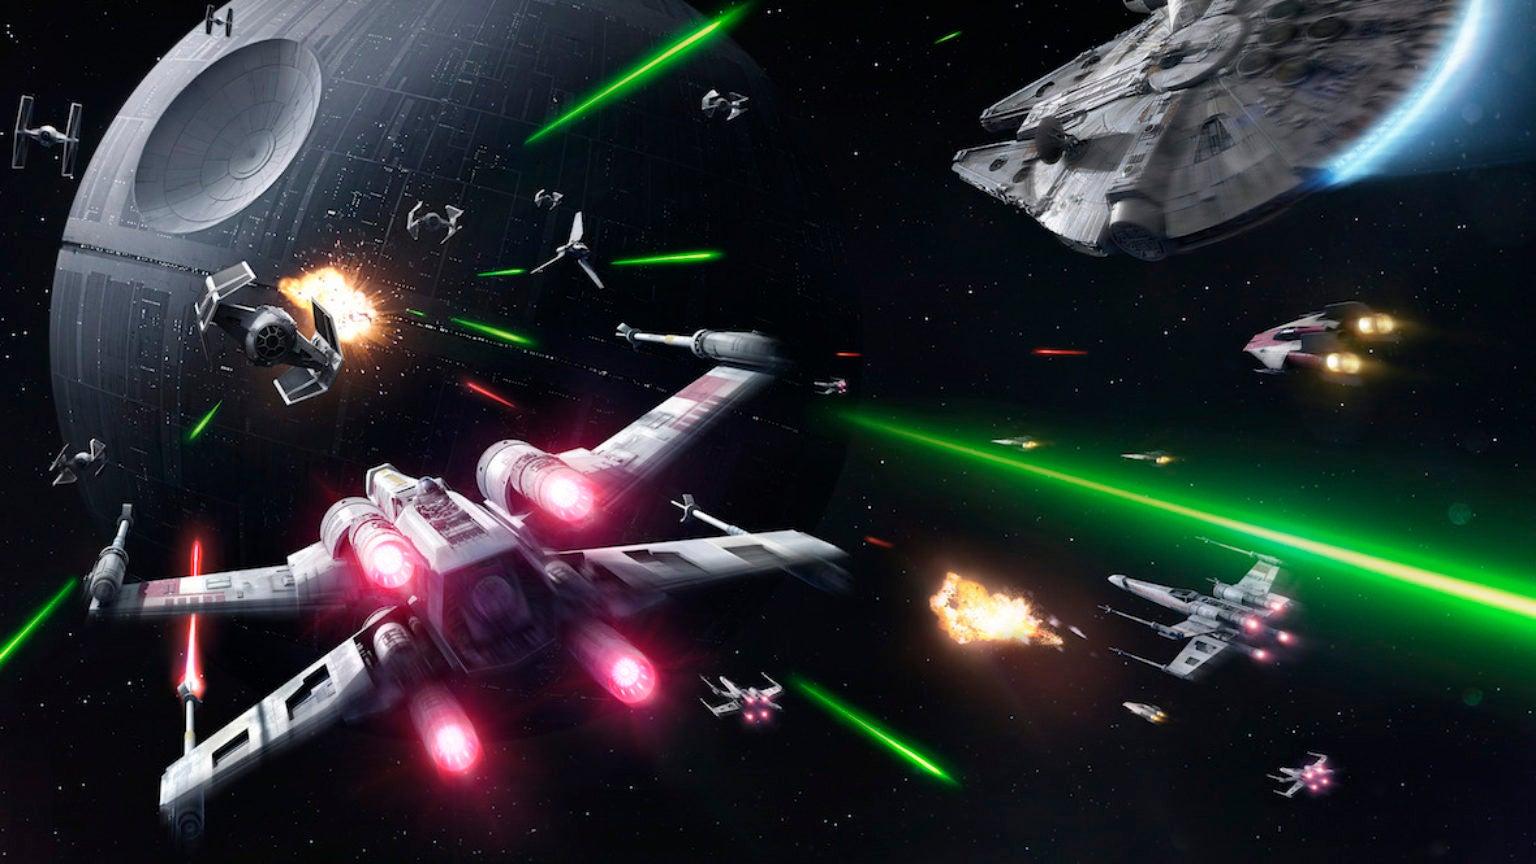 Image for Disney teases new Star Wars video game reveal for December 14